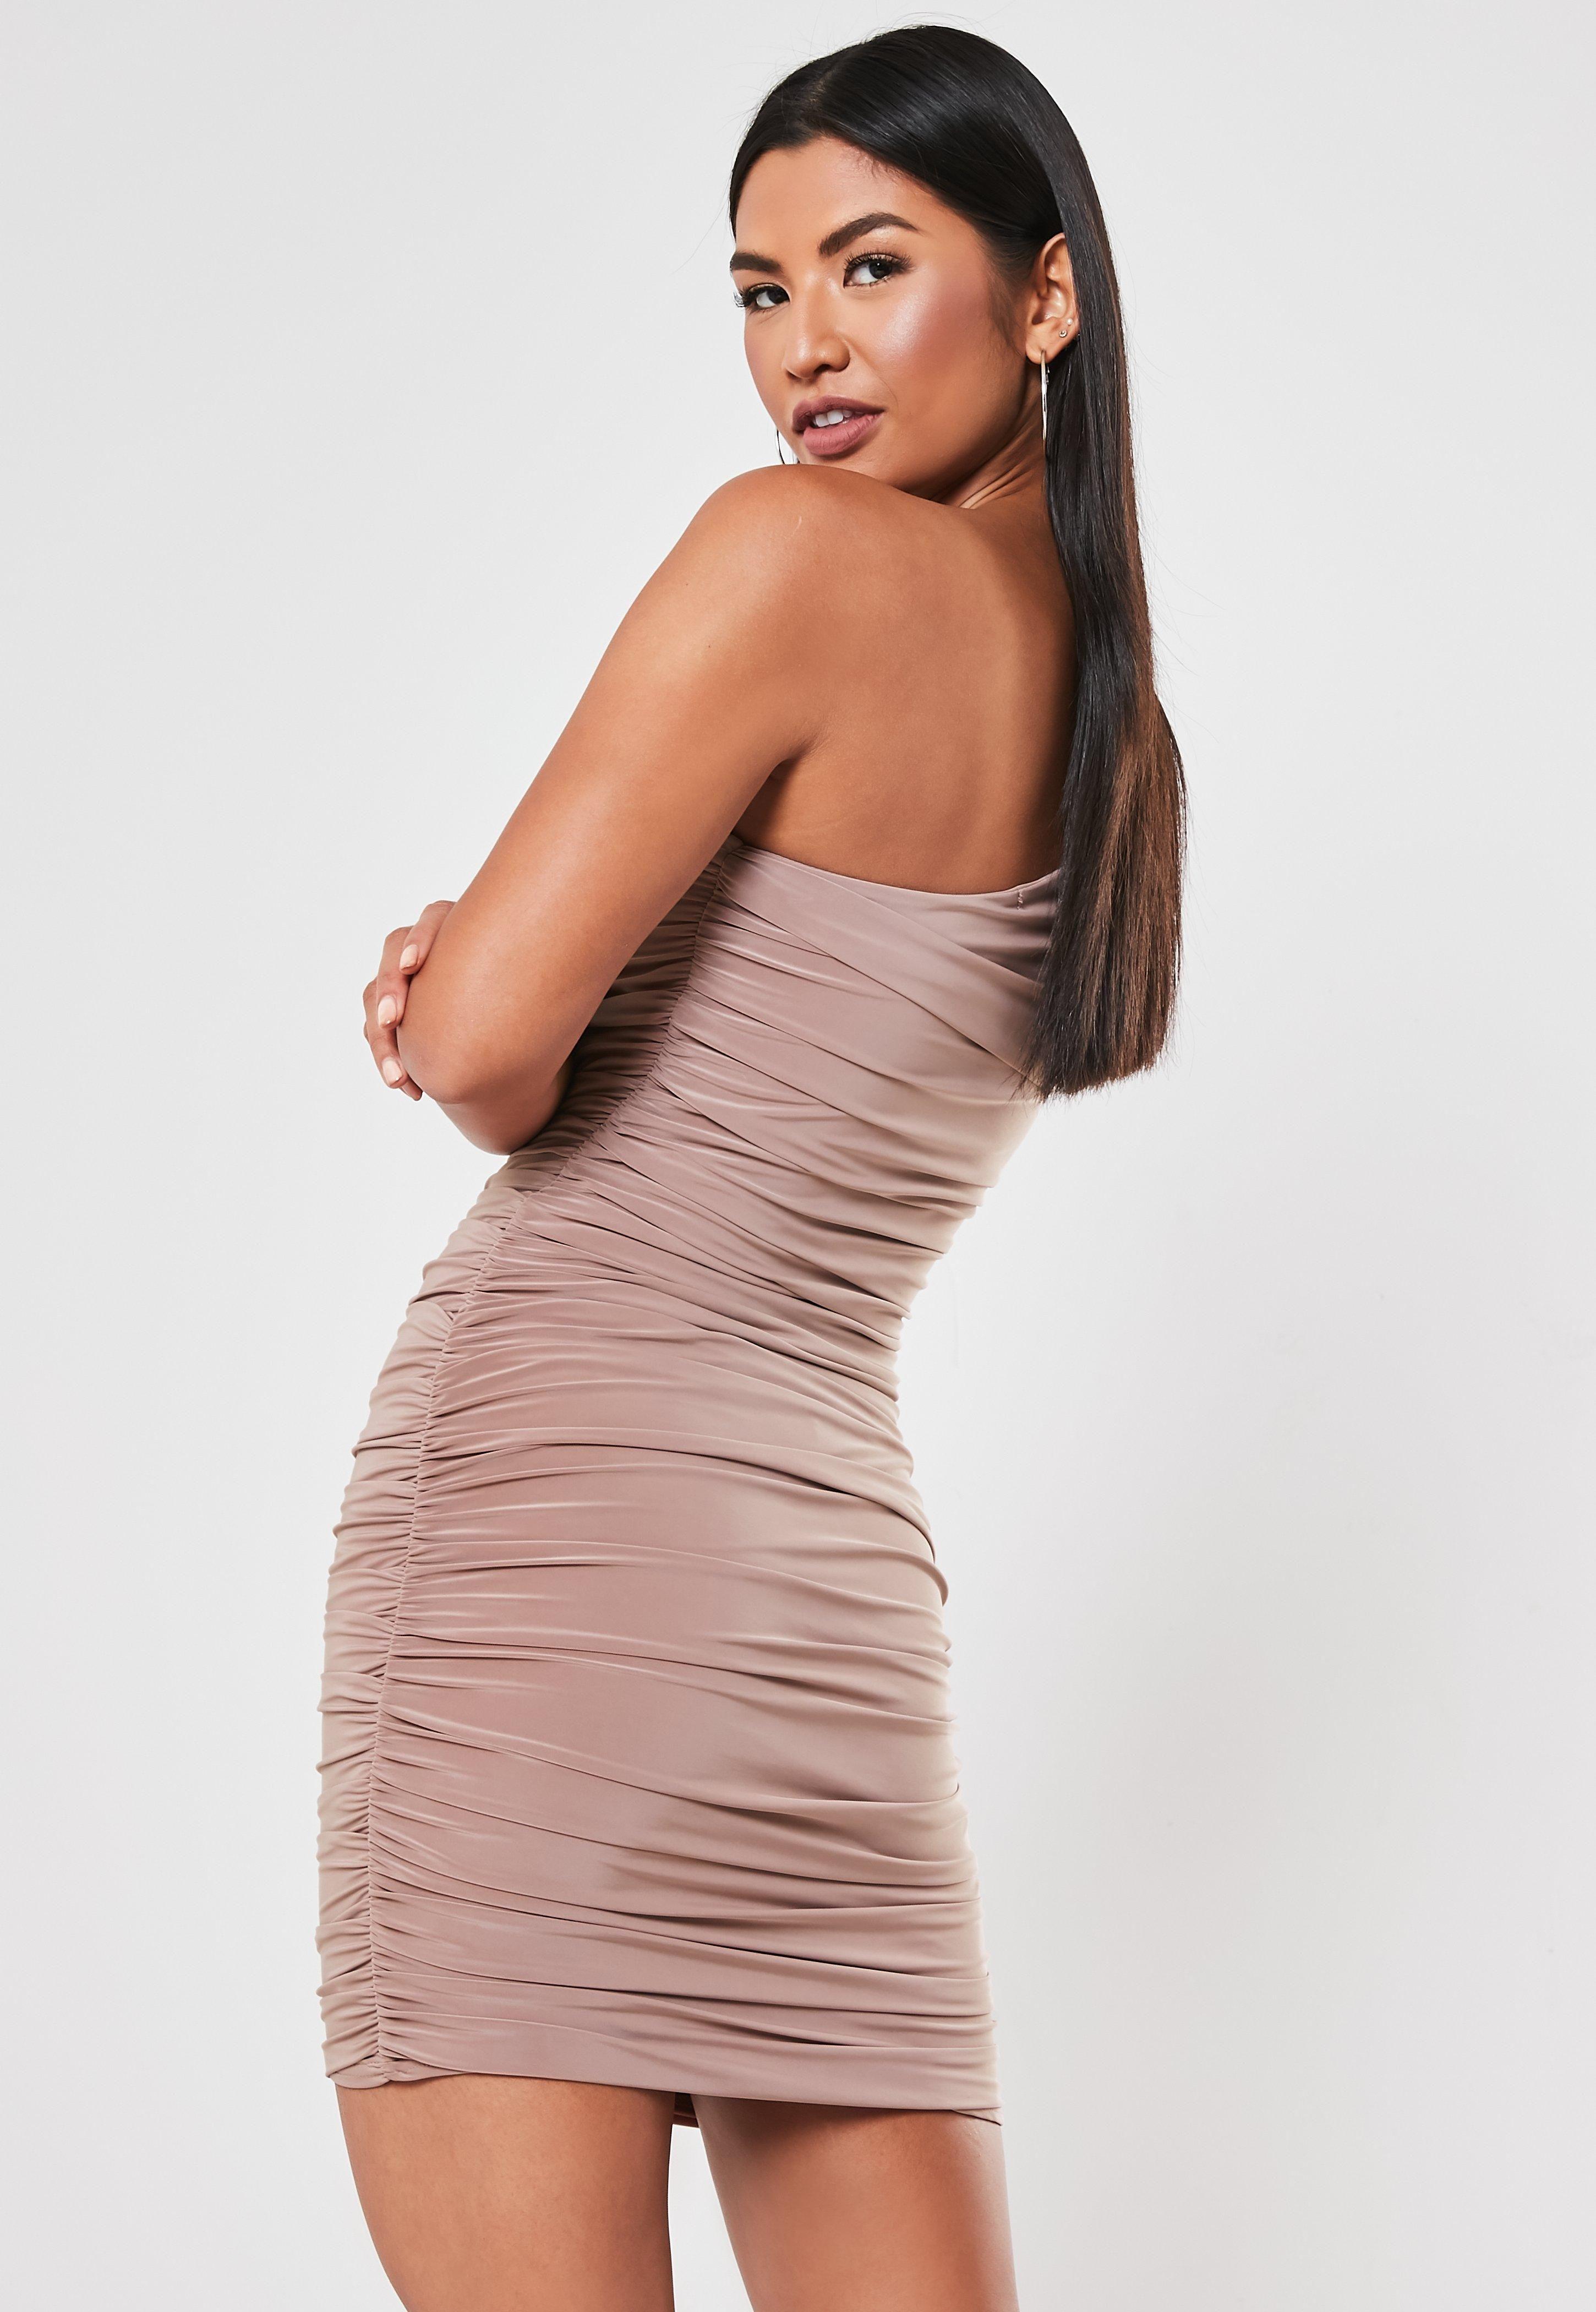 Blush Slinky One Shoulder Ruched Bodycon Mini Dress